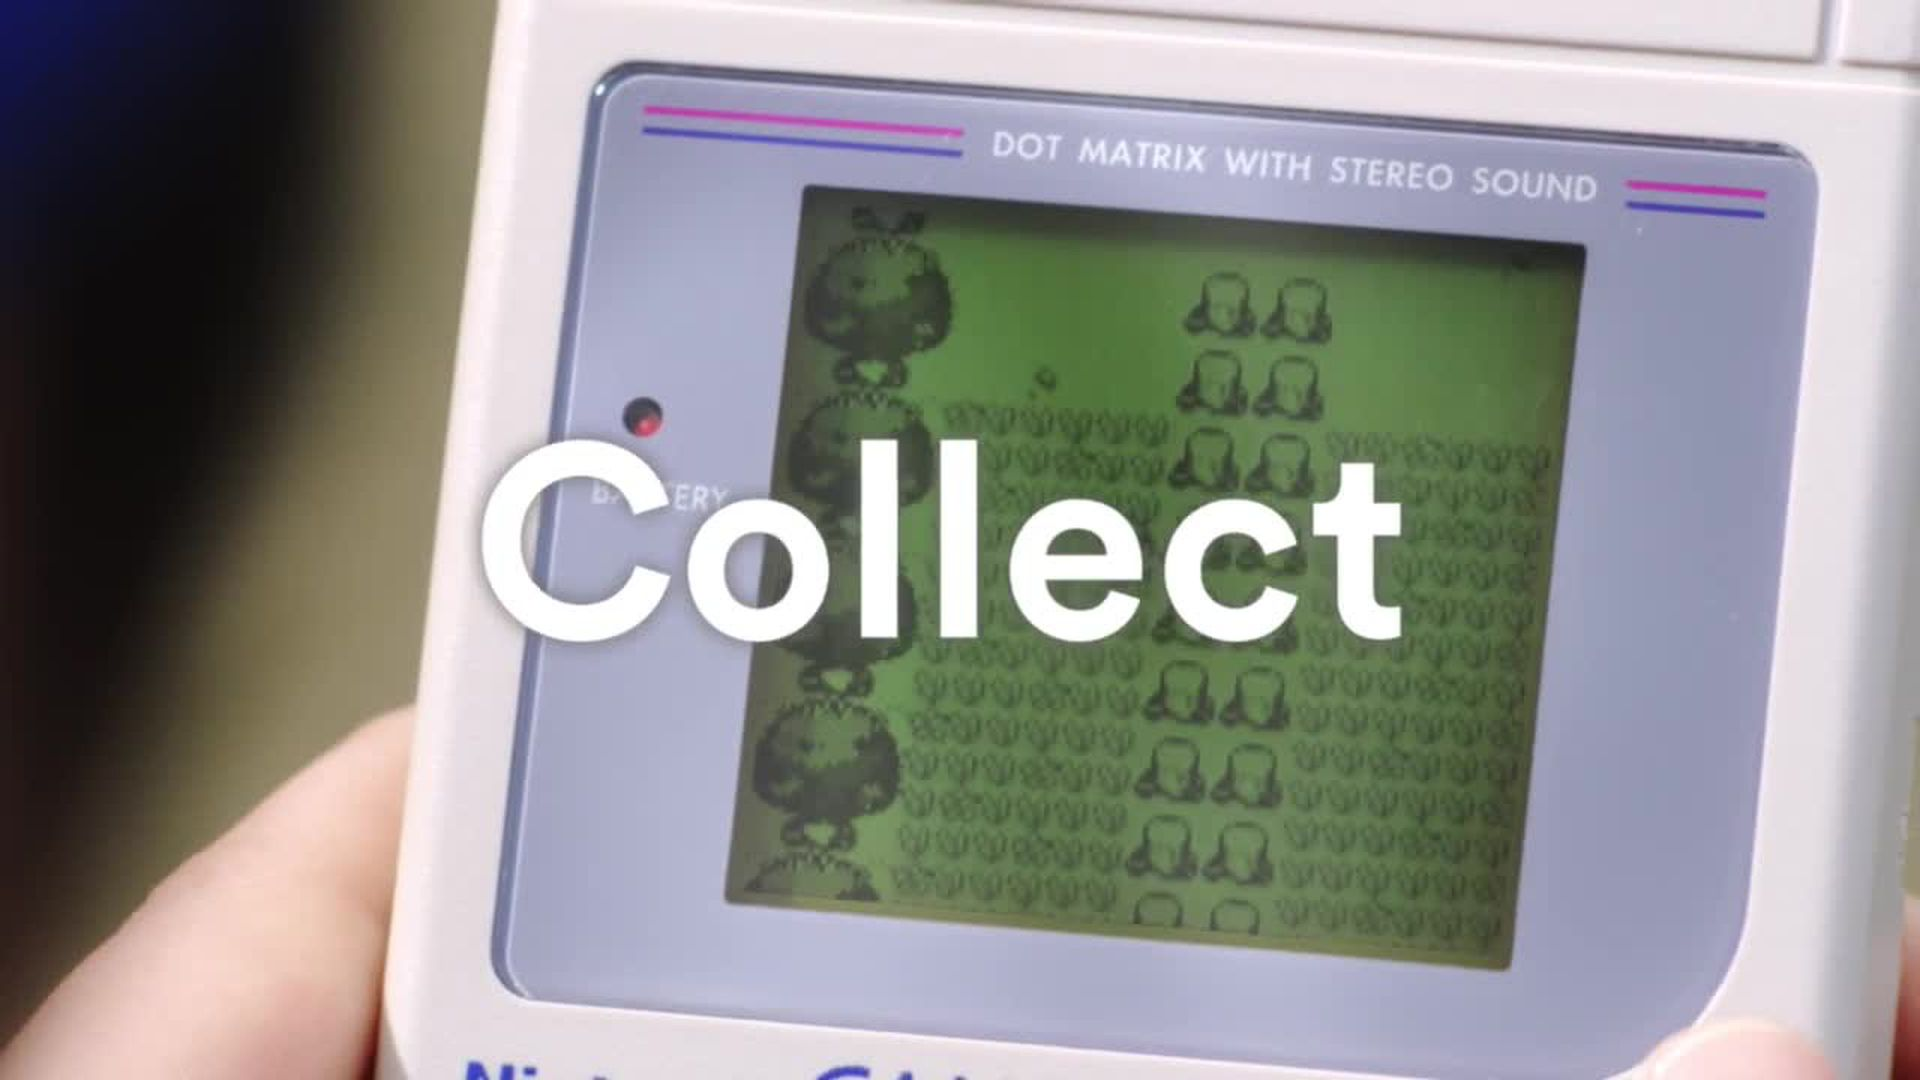 Game boy color quanto vale - Game Boy Color Quanto Vale 22